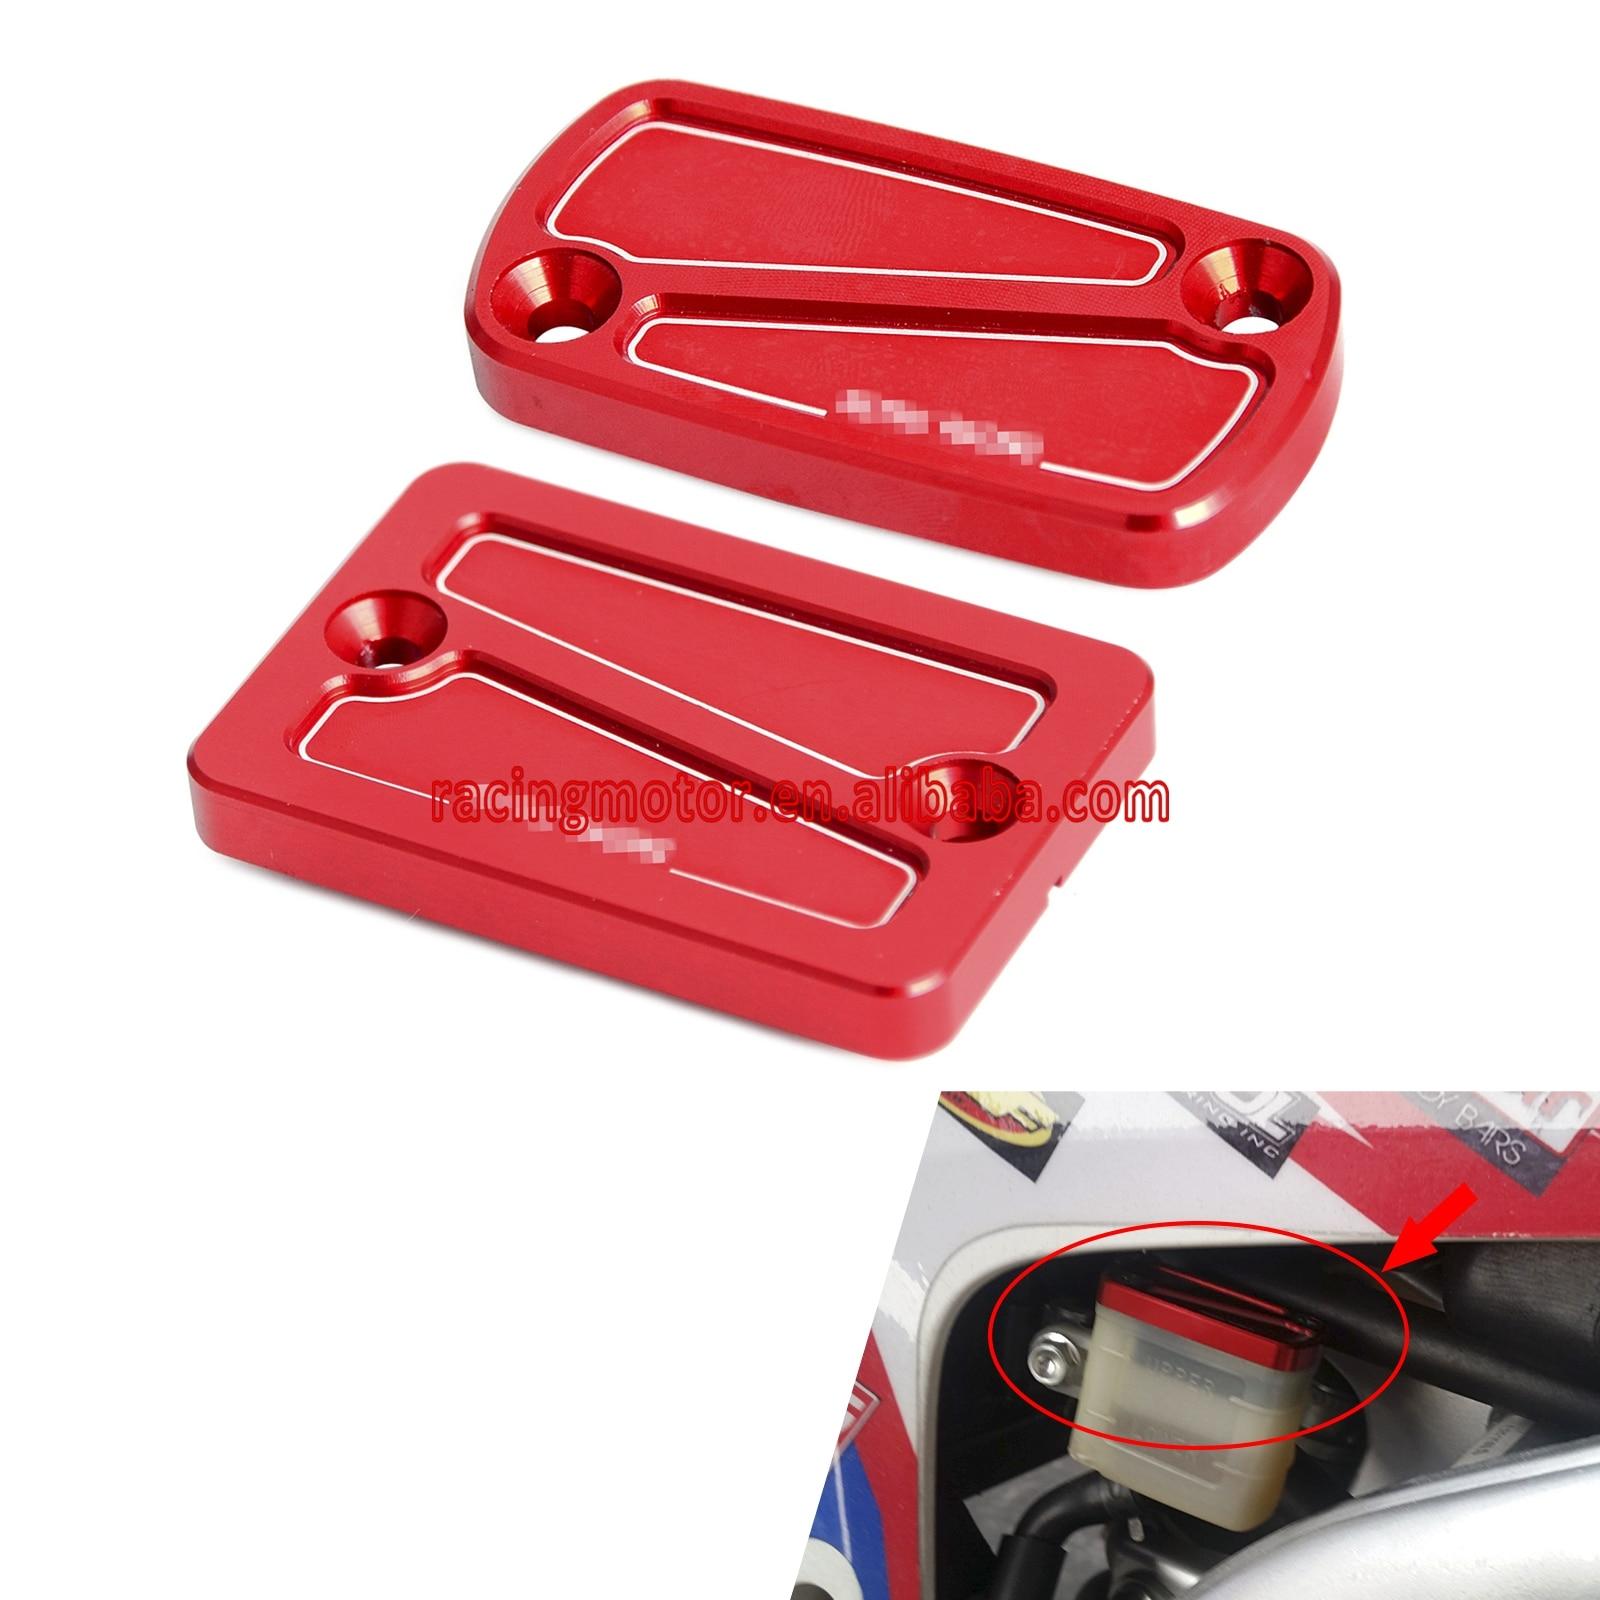 For Honda CRF250L CRF250M 2012 - 2015 2013 2014 CRF250 L/M CNC Front & Rear Brake Reservoir Fluid Cover Cap прокладки клапанной крышки honda vtr1000f